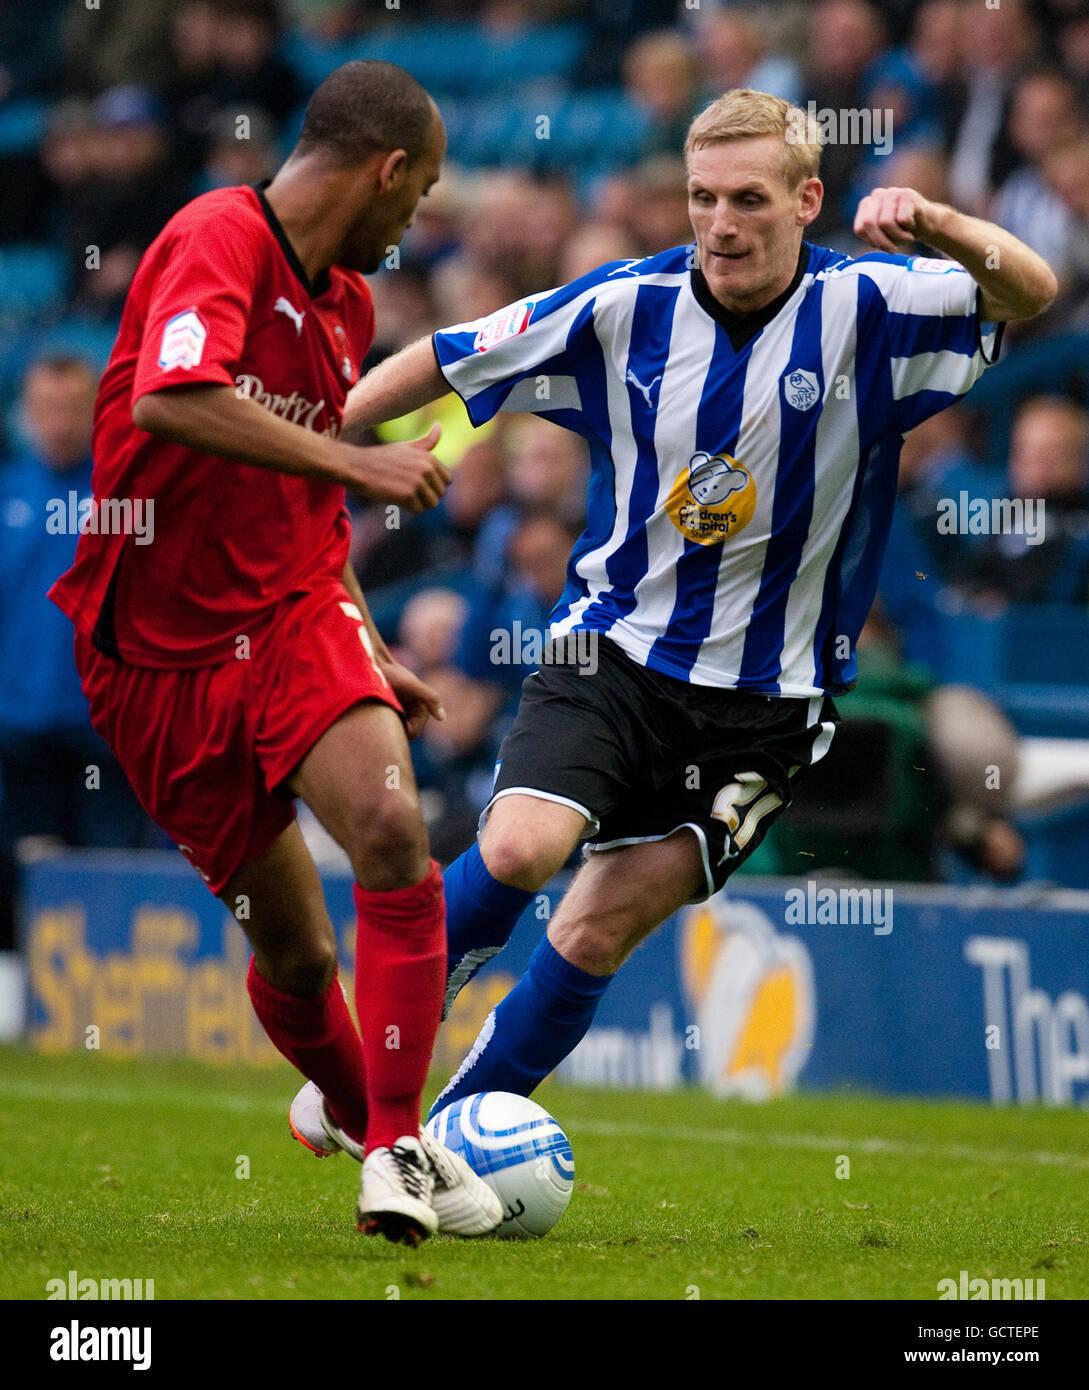 Soccer - npower Football League One - Sheffield Wednesday v Leyton Orient - Hillsborough Stock Photo